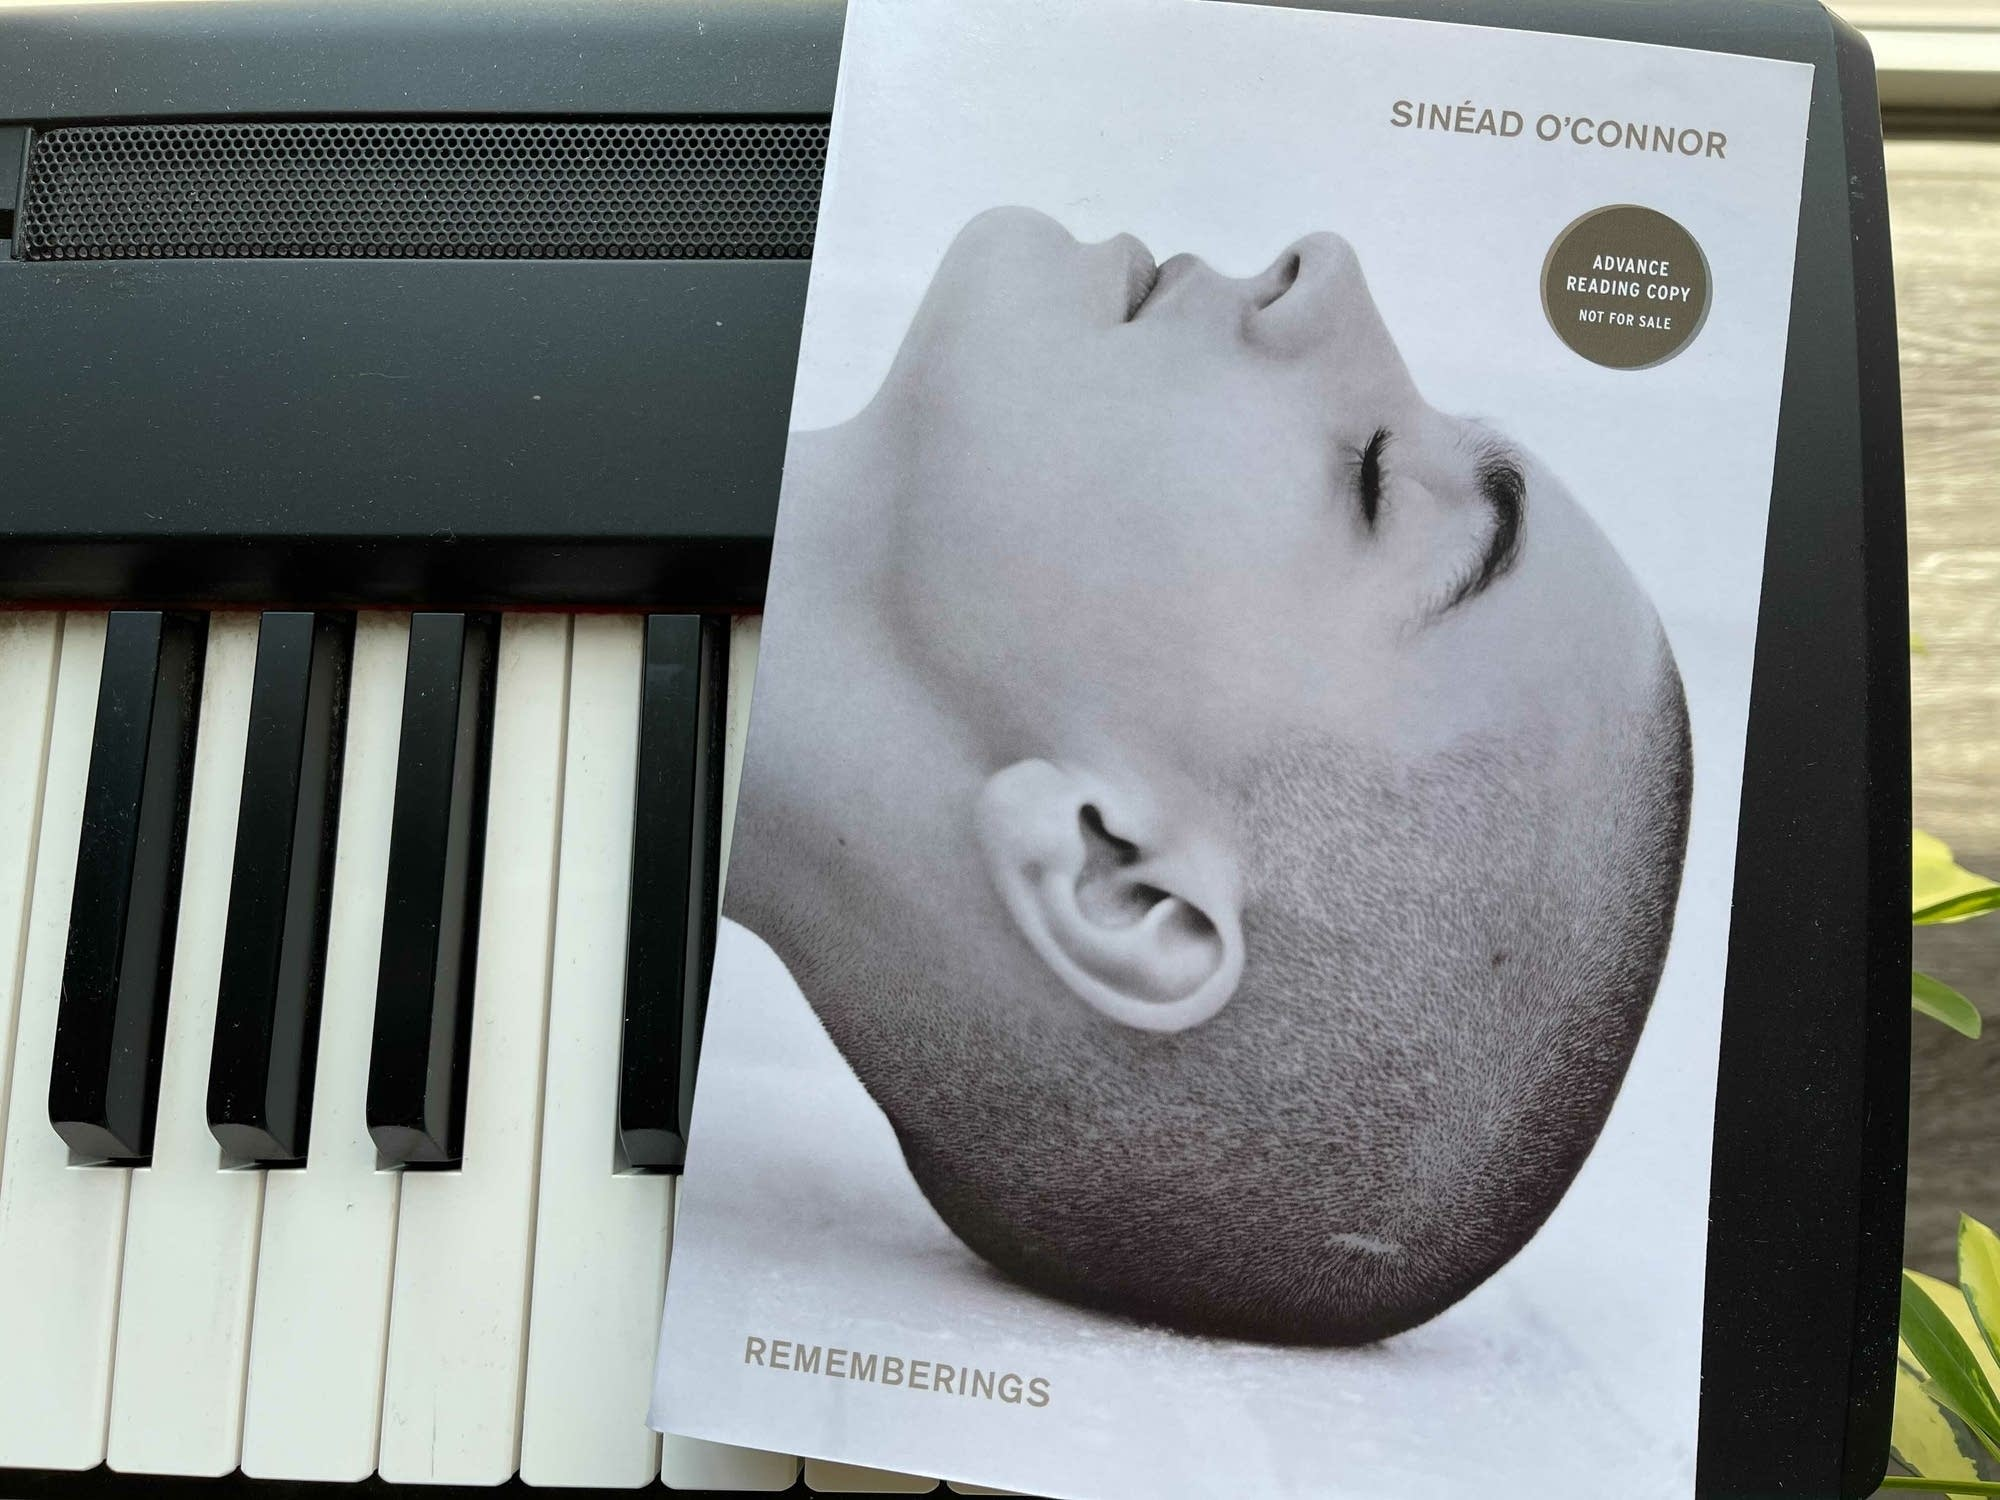 Book on keyboard: 'Rememberings.'